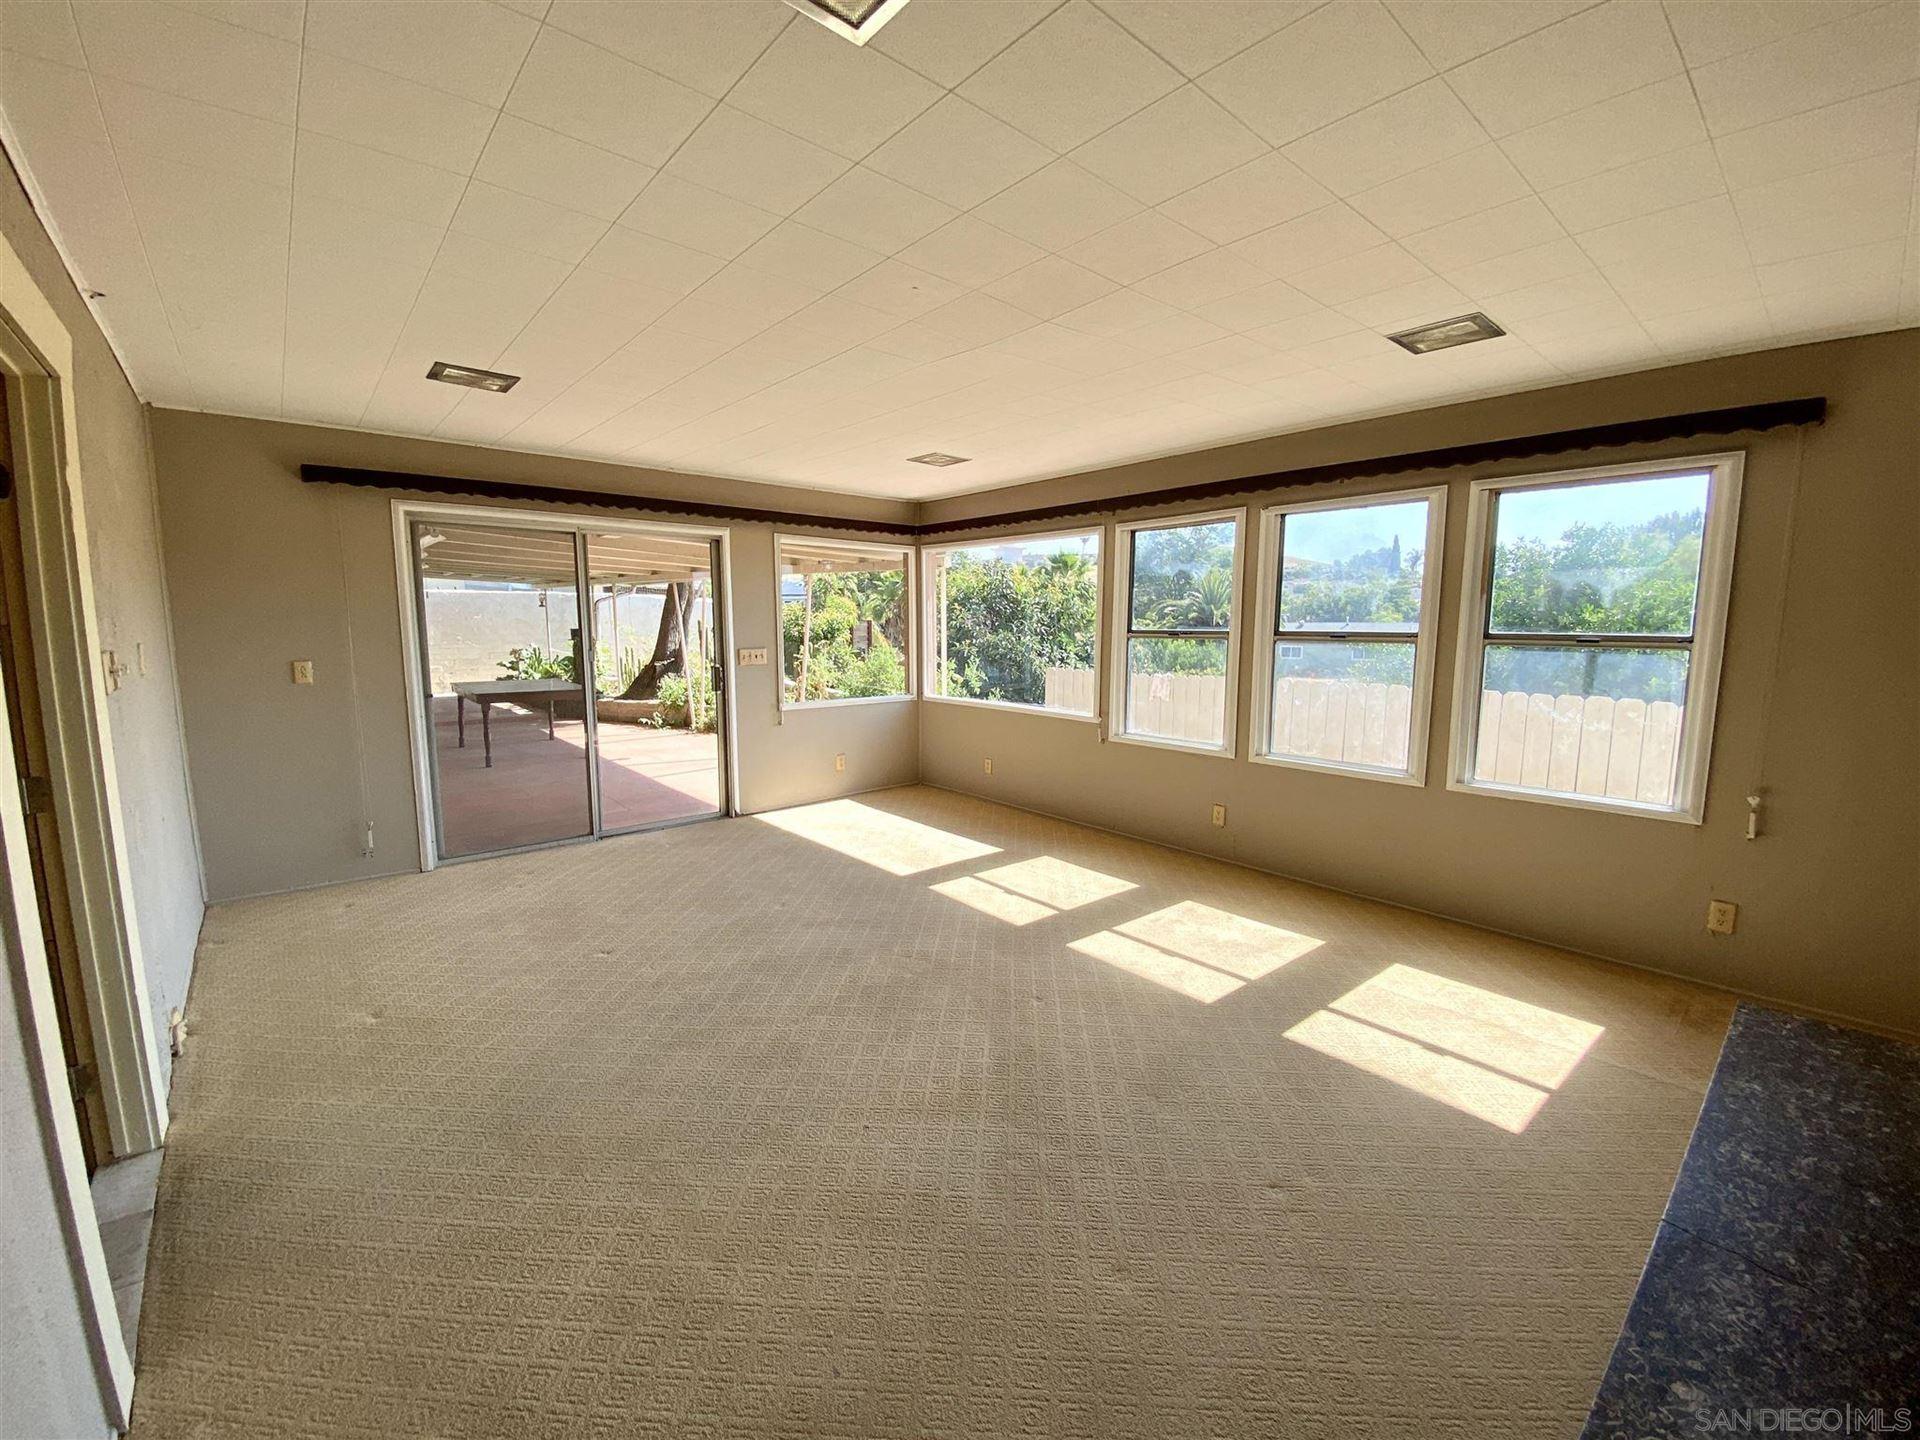 Photo of 9609 Vomac Rd., Santee, CA 92171 (MLS # 210020909)